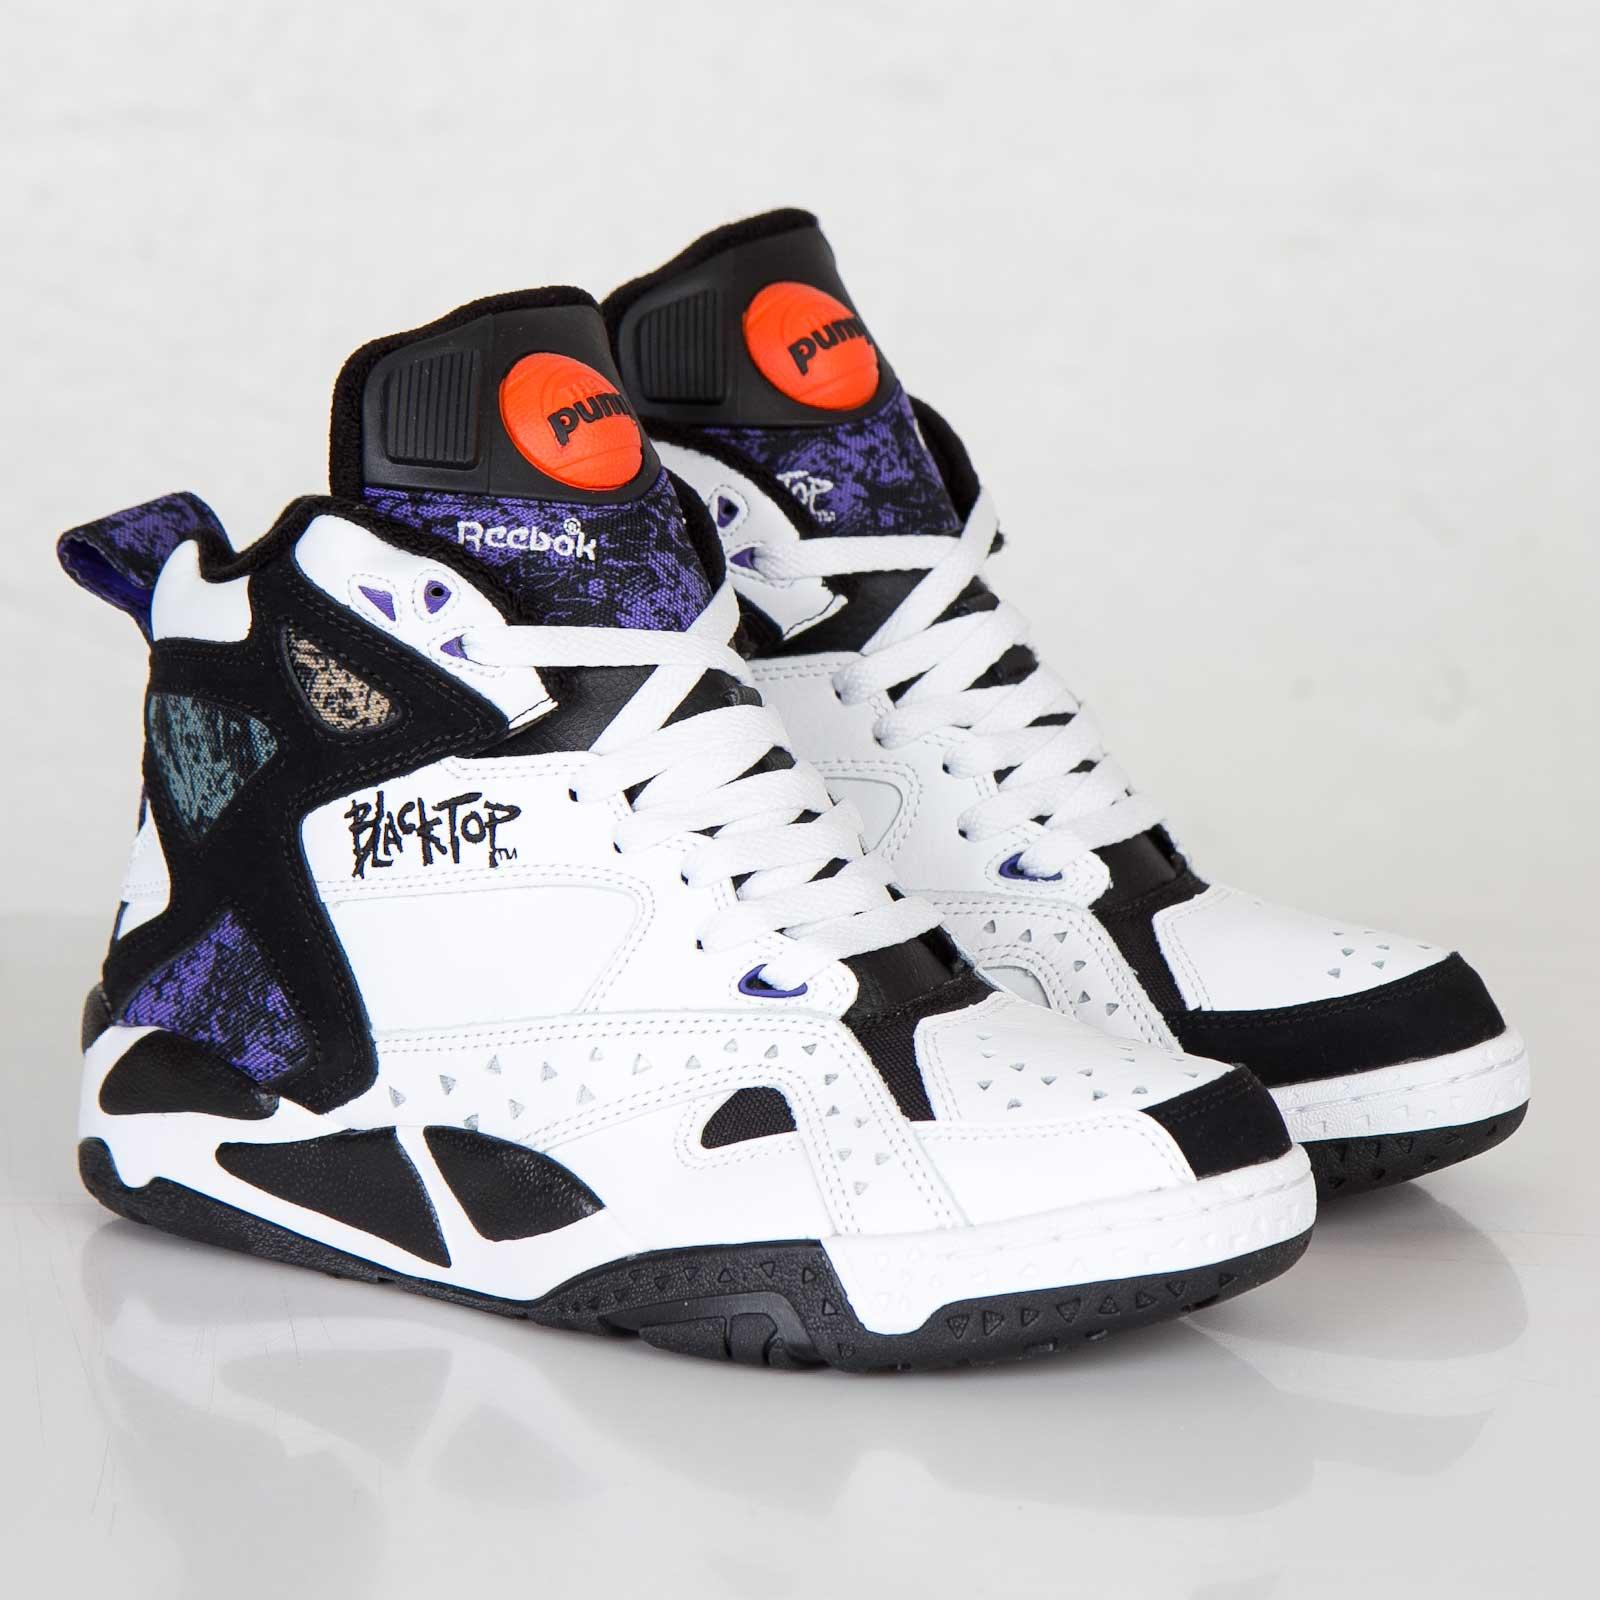 55affc99ebf0 Reebok Blacktop Battleground - V55494 - Sneakersnstuff